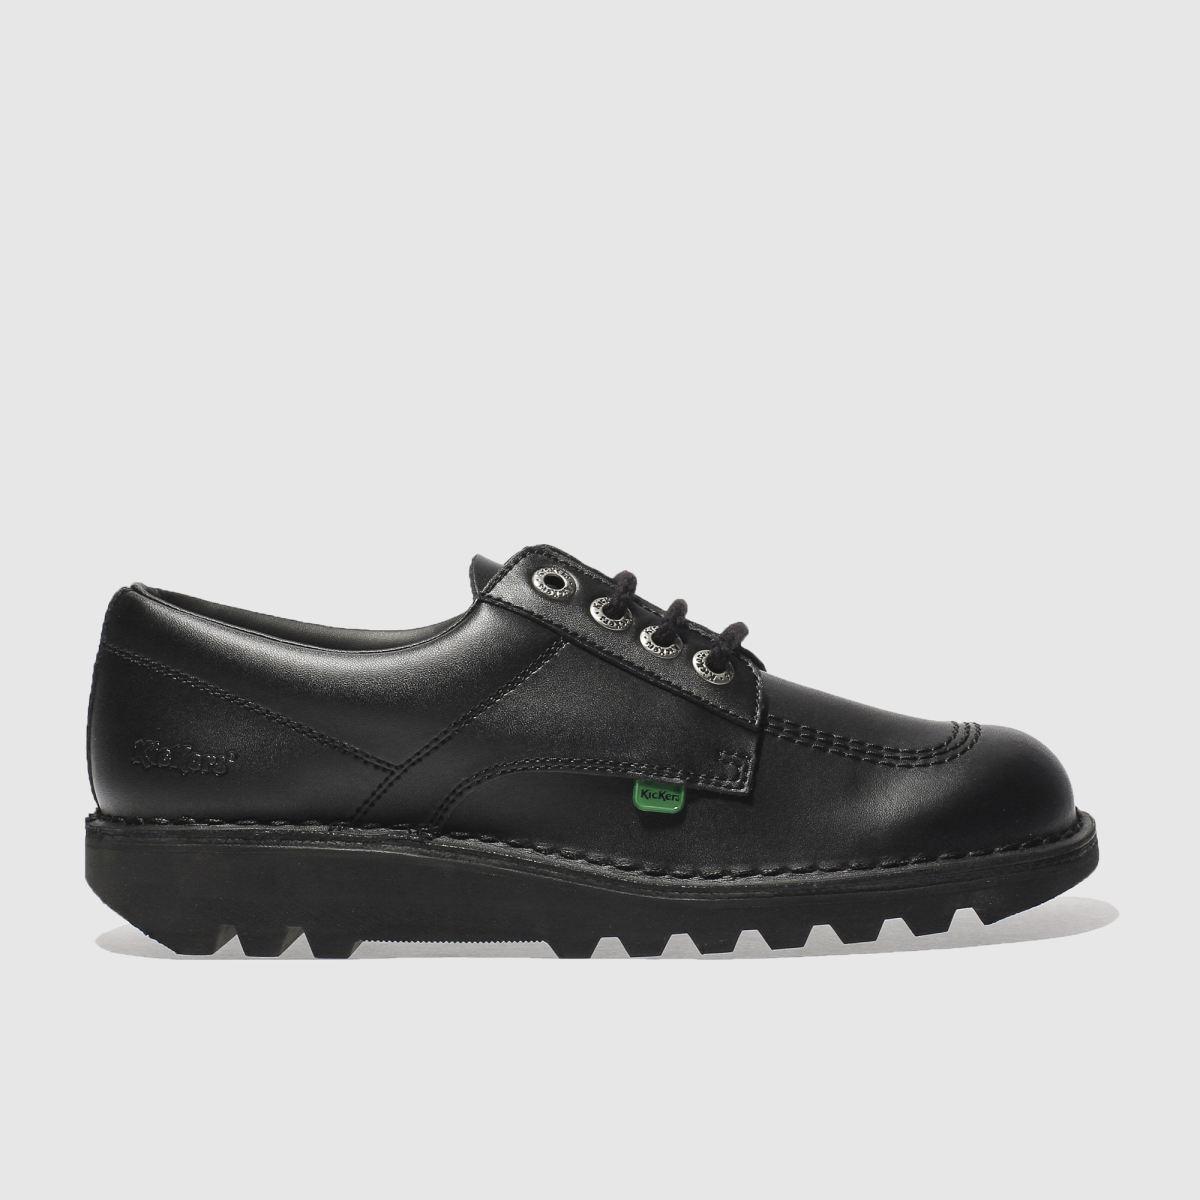 Kickers Black Kick Lo Shoes